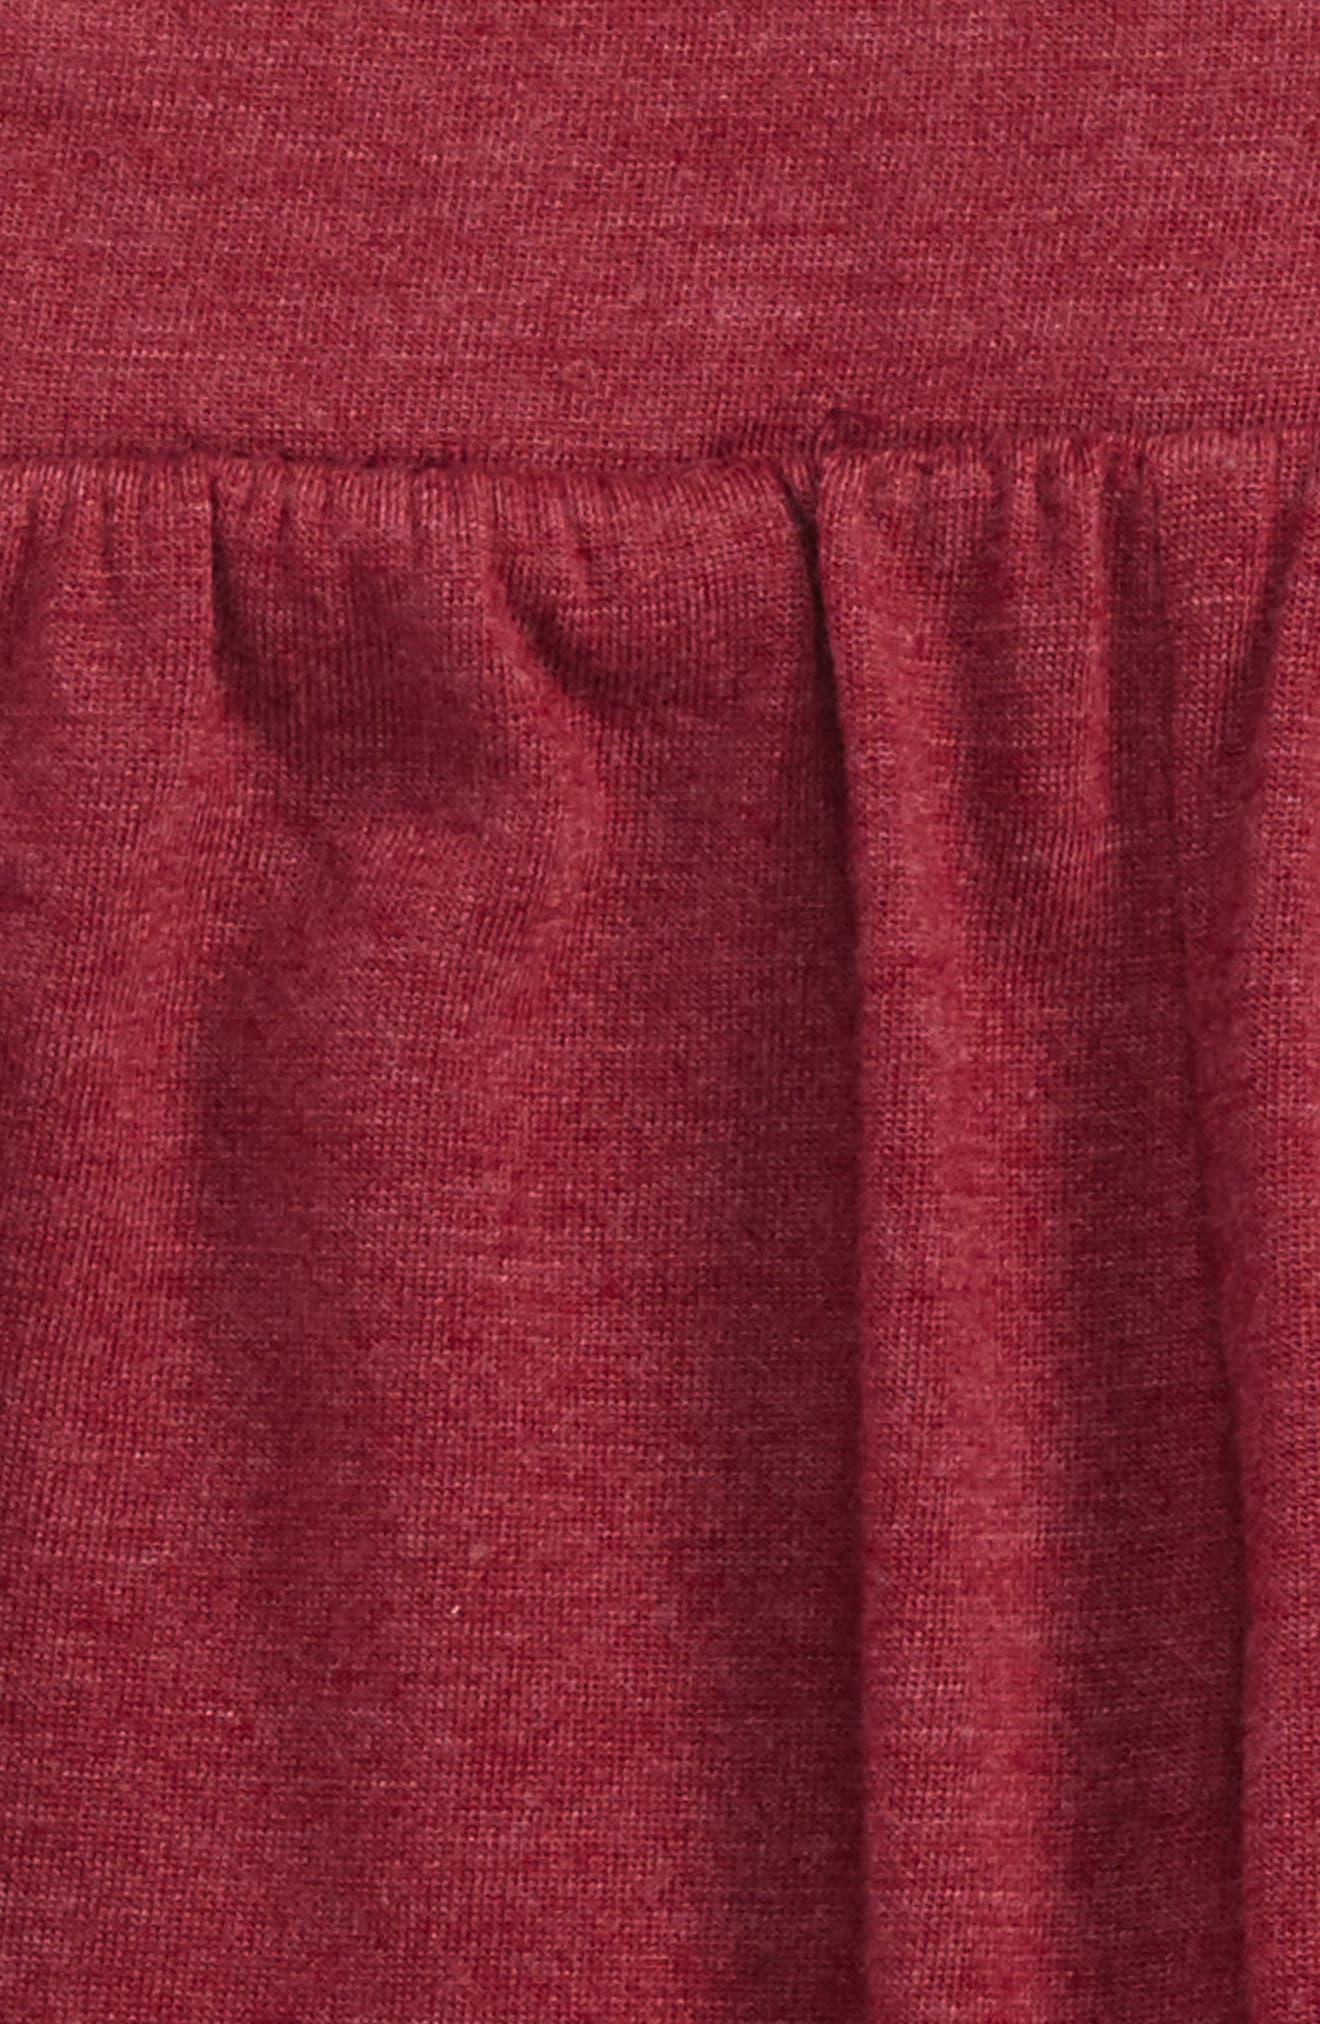 Alternate Image 2  - Peek Jenna Sweatpants (Baby Girls)